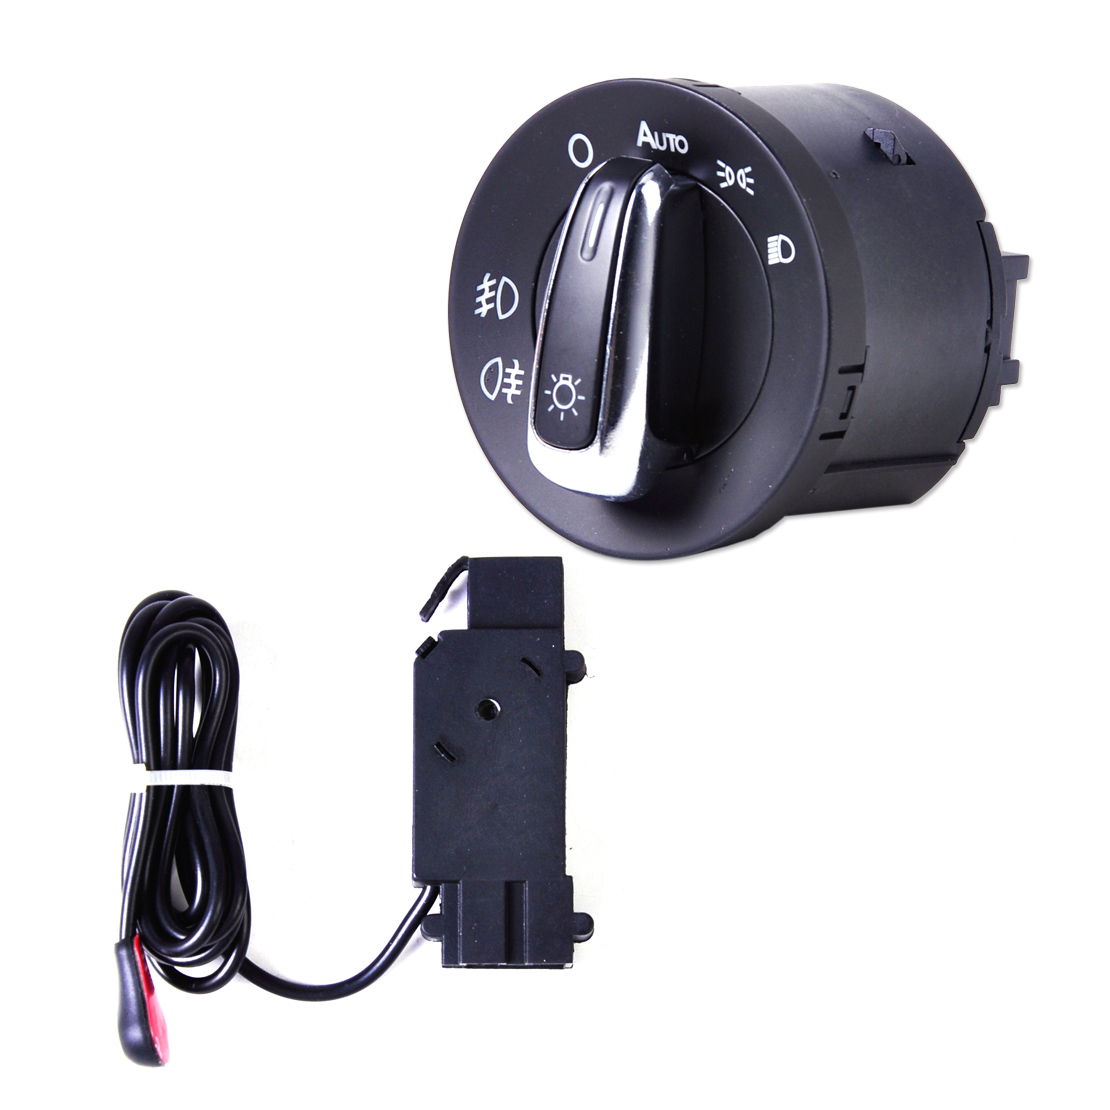 Auto Headlight Sensor & Switch For VW Golf Jetta MK5 MK6